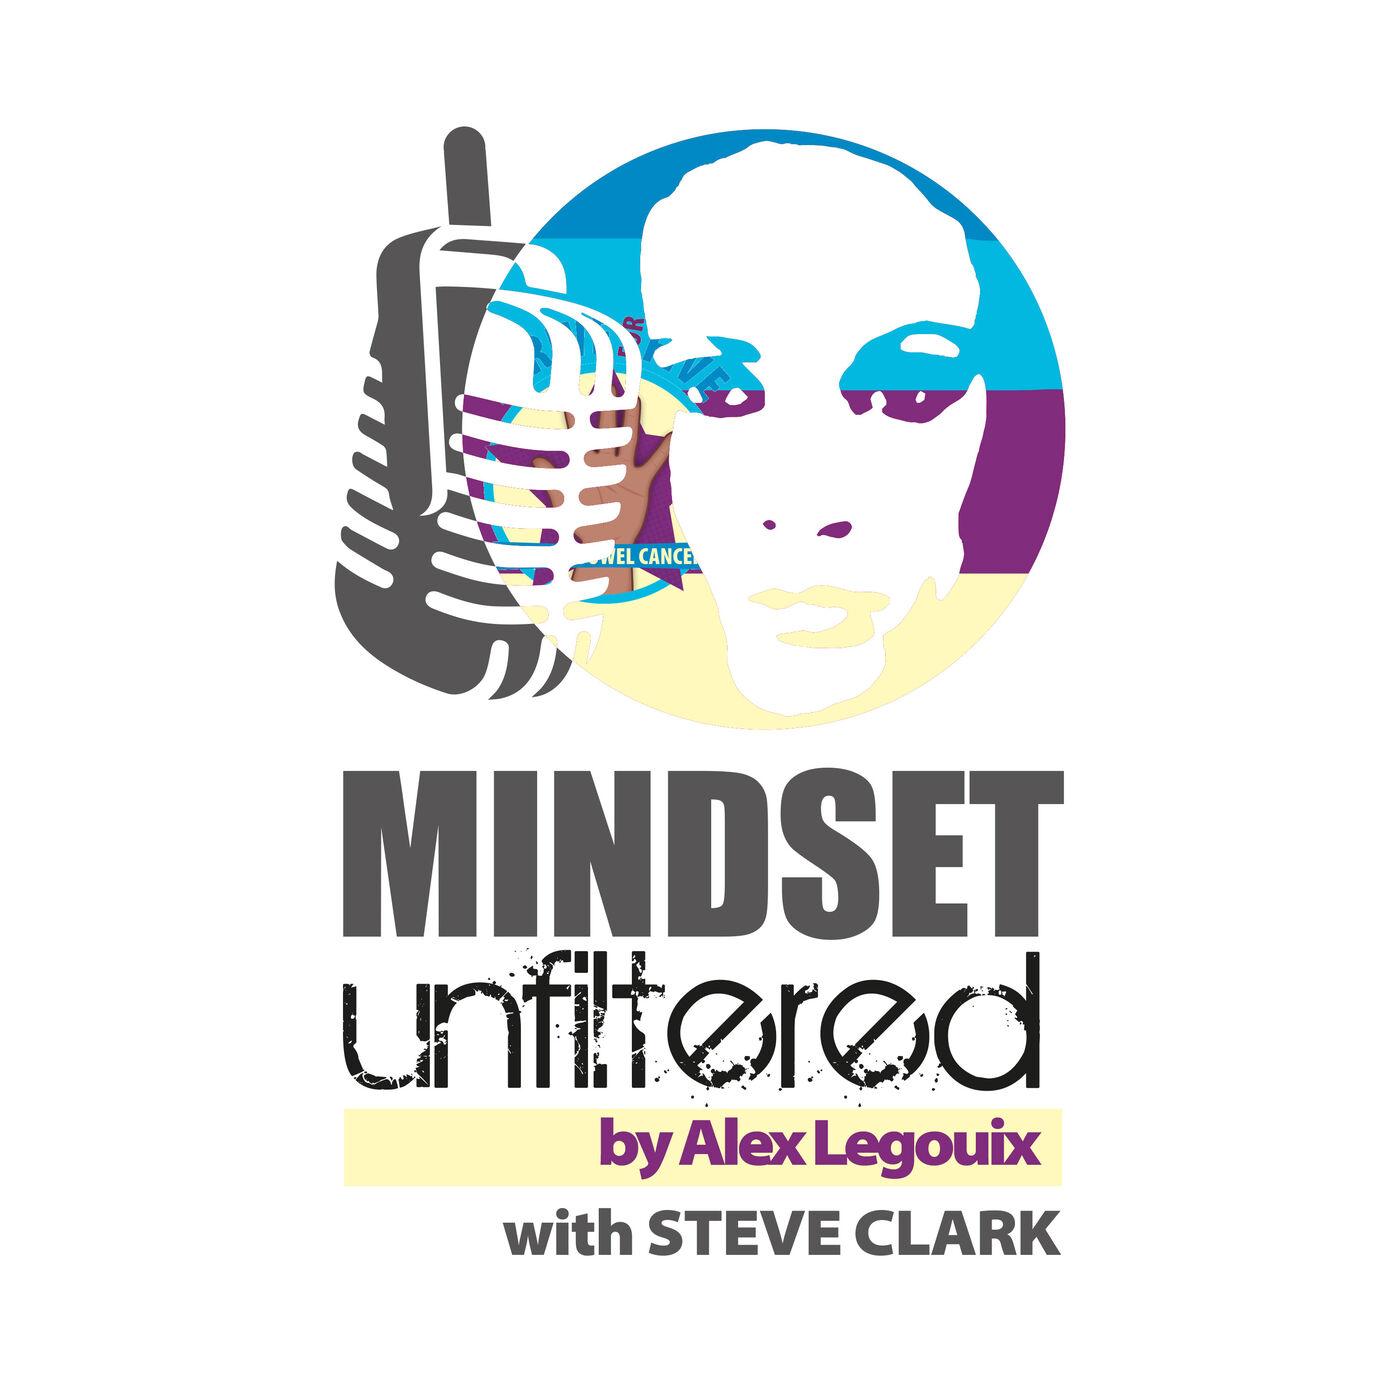 S2 EP4 - Part 1: Steve Clark - Stage 4 Bowel Cancer survivor and superhero: Diagnosis, dealing with the fear & positive mindset